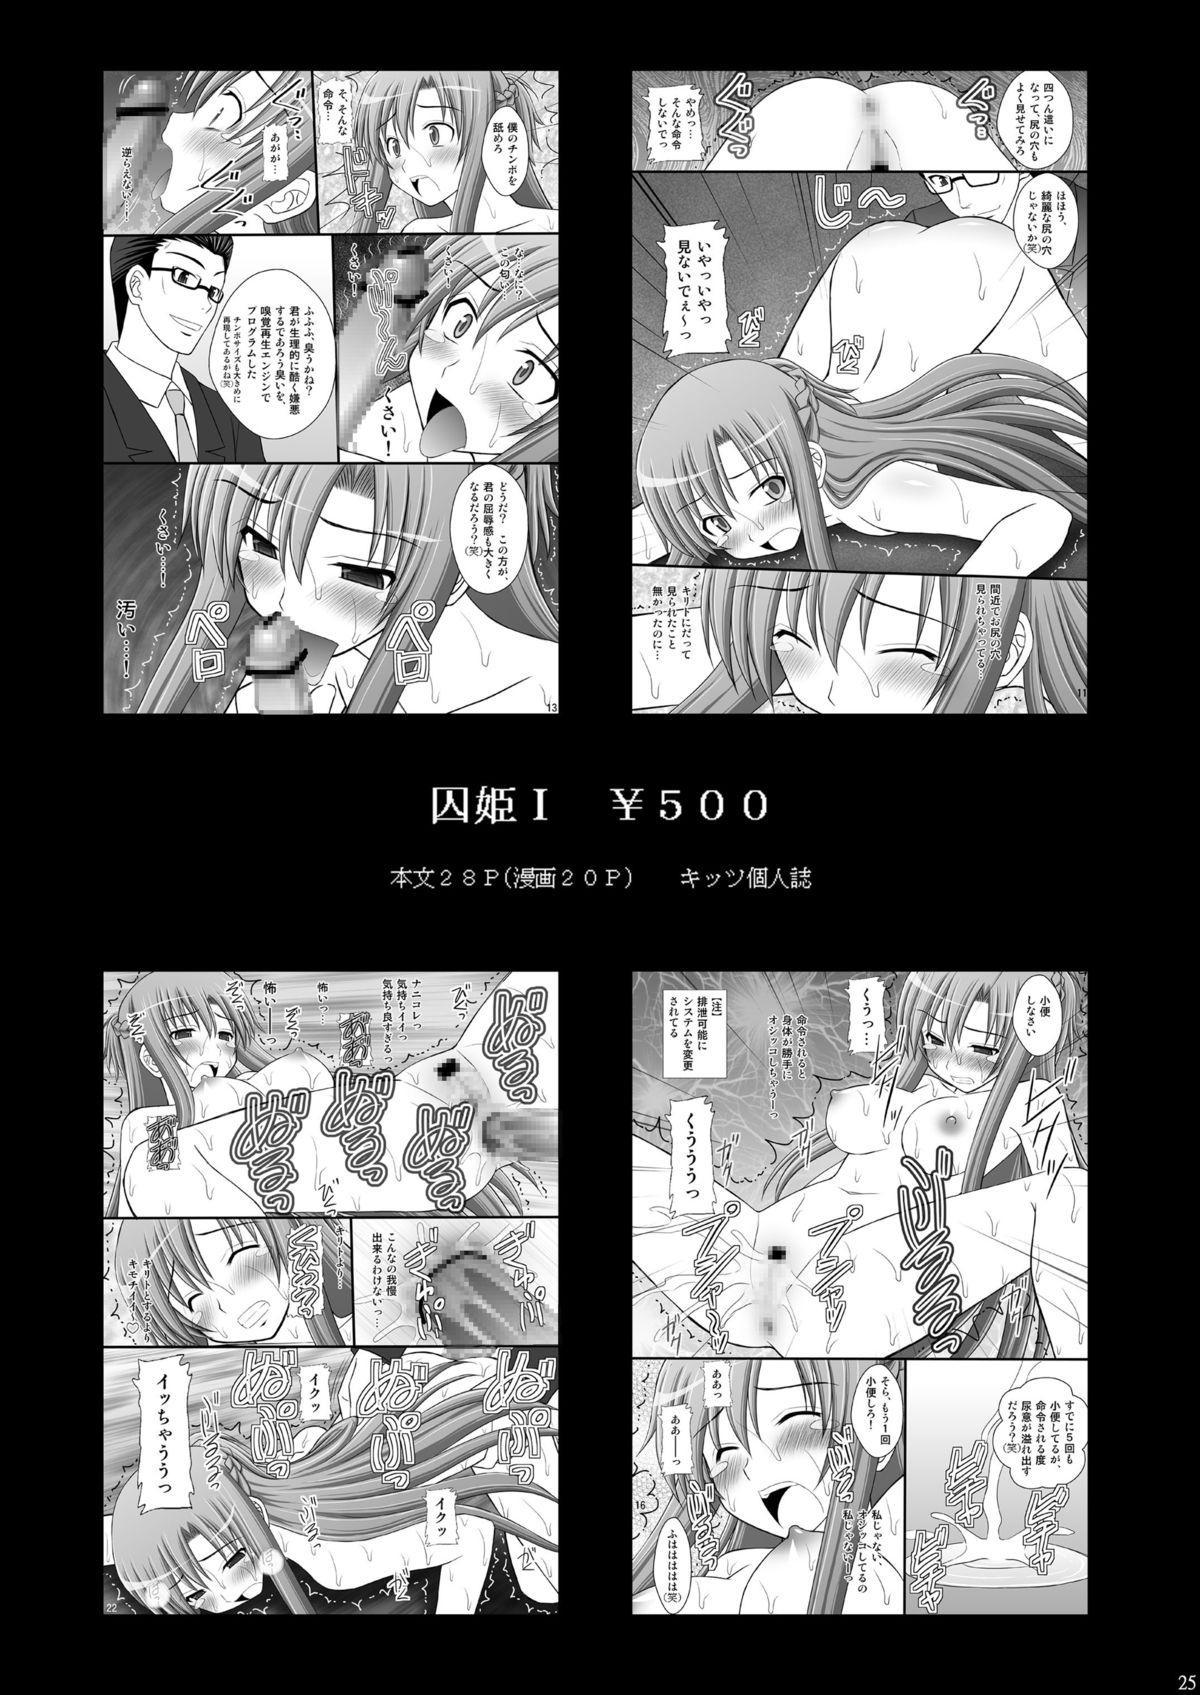 Toraware Hime III: Hostage Princess III 23